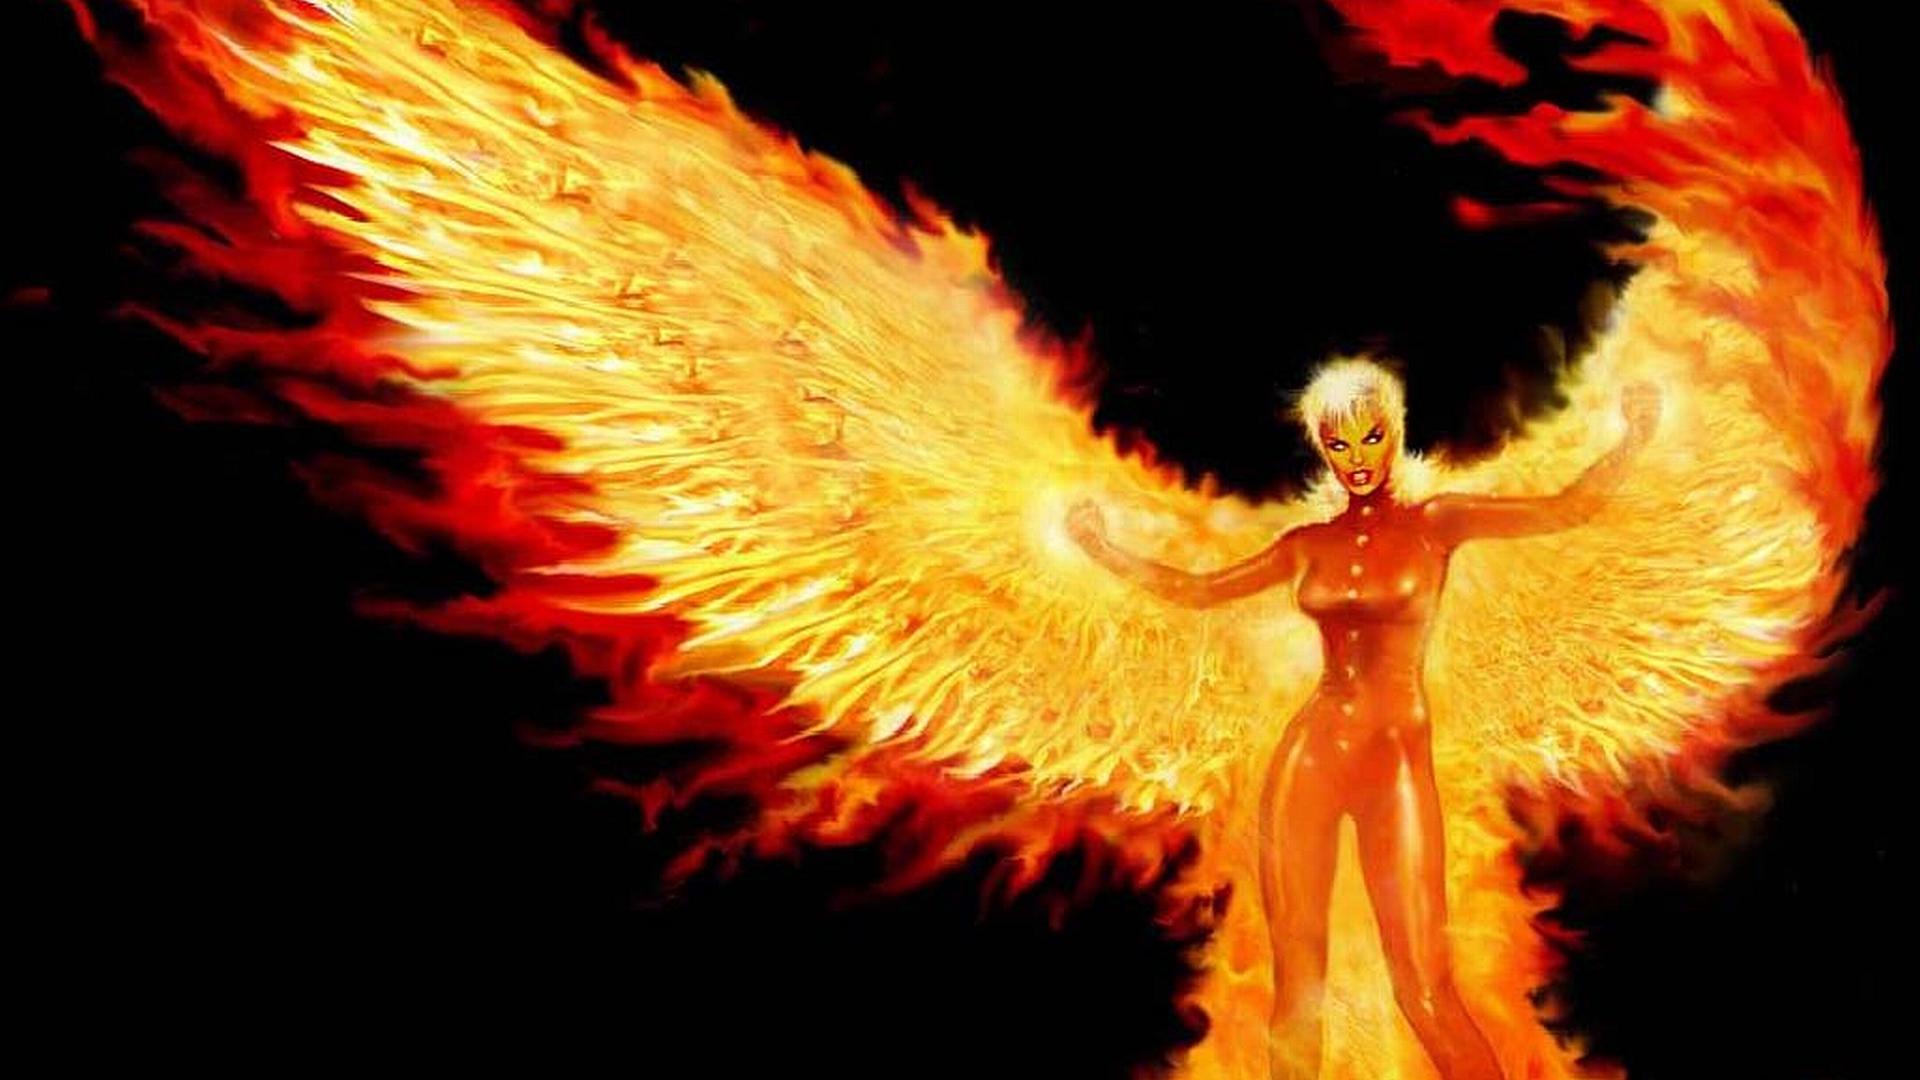 Phoenix Fondo De Pantalla Hd Fondo De Escritorio